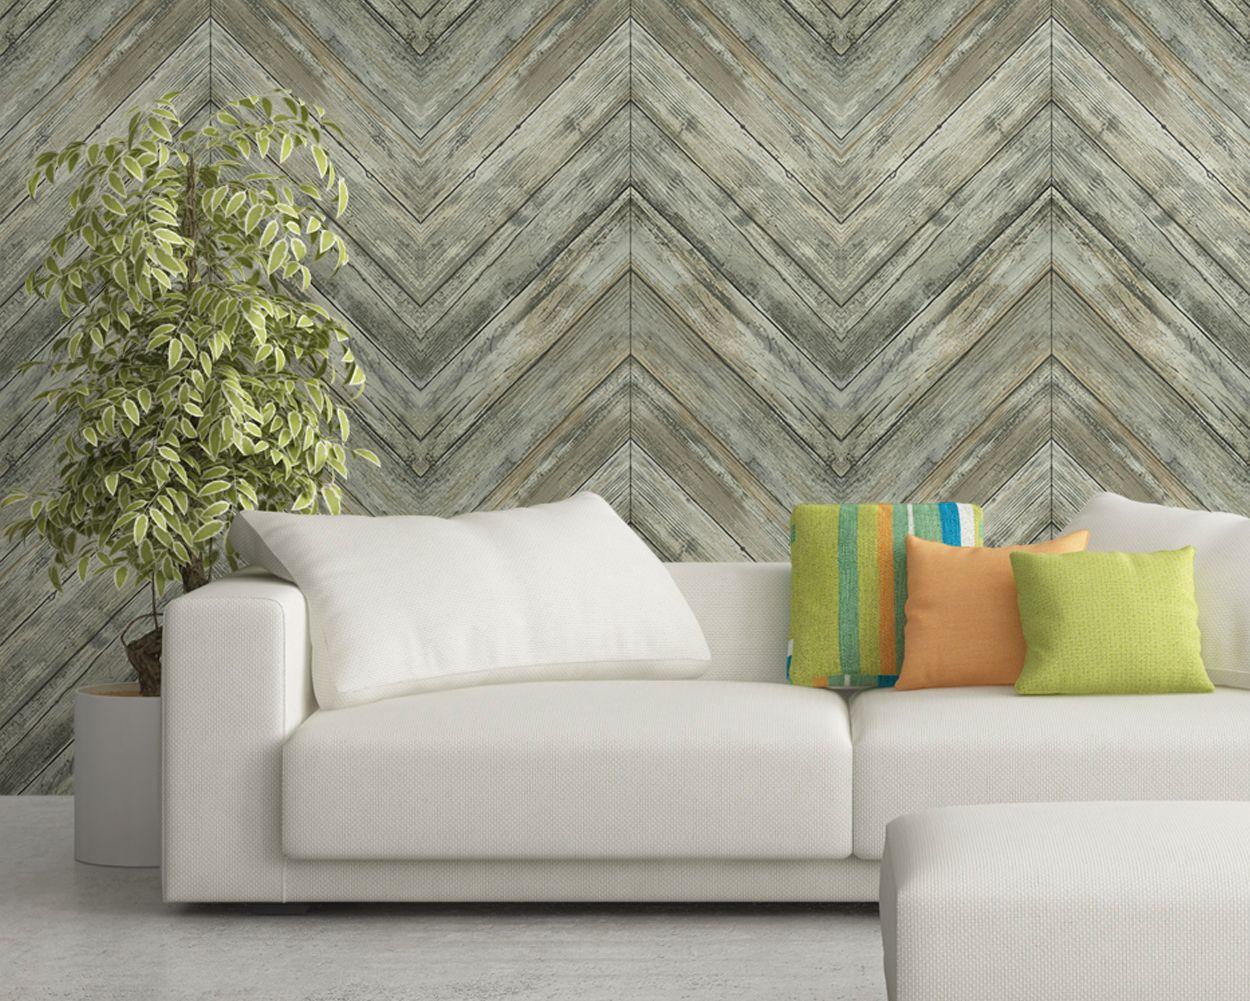 Herringbone Wood Wall Art Kuarki Lifestyle Solutions